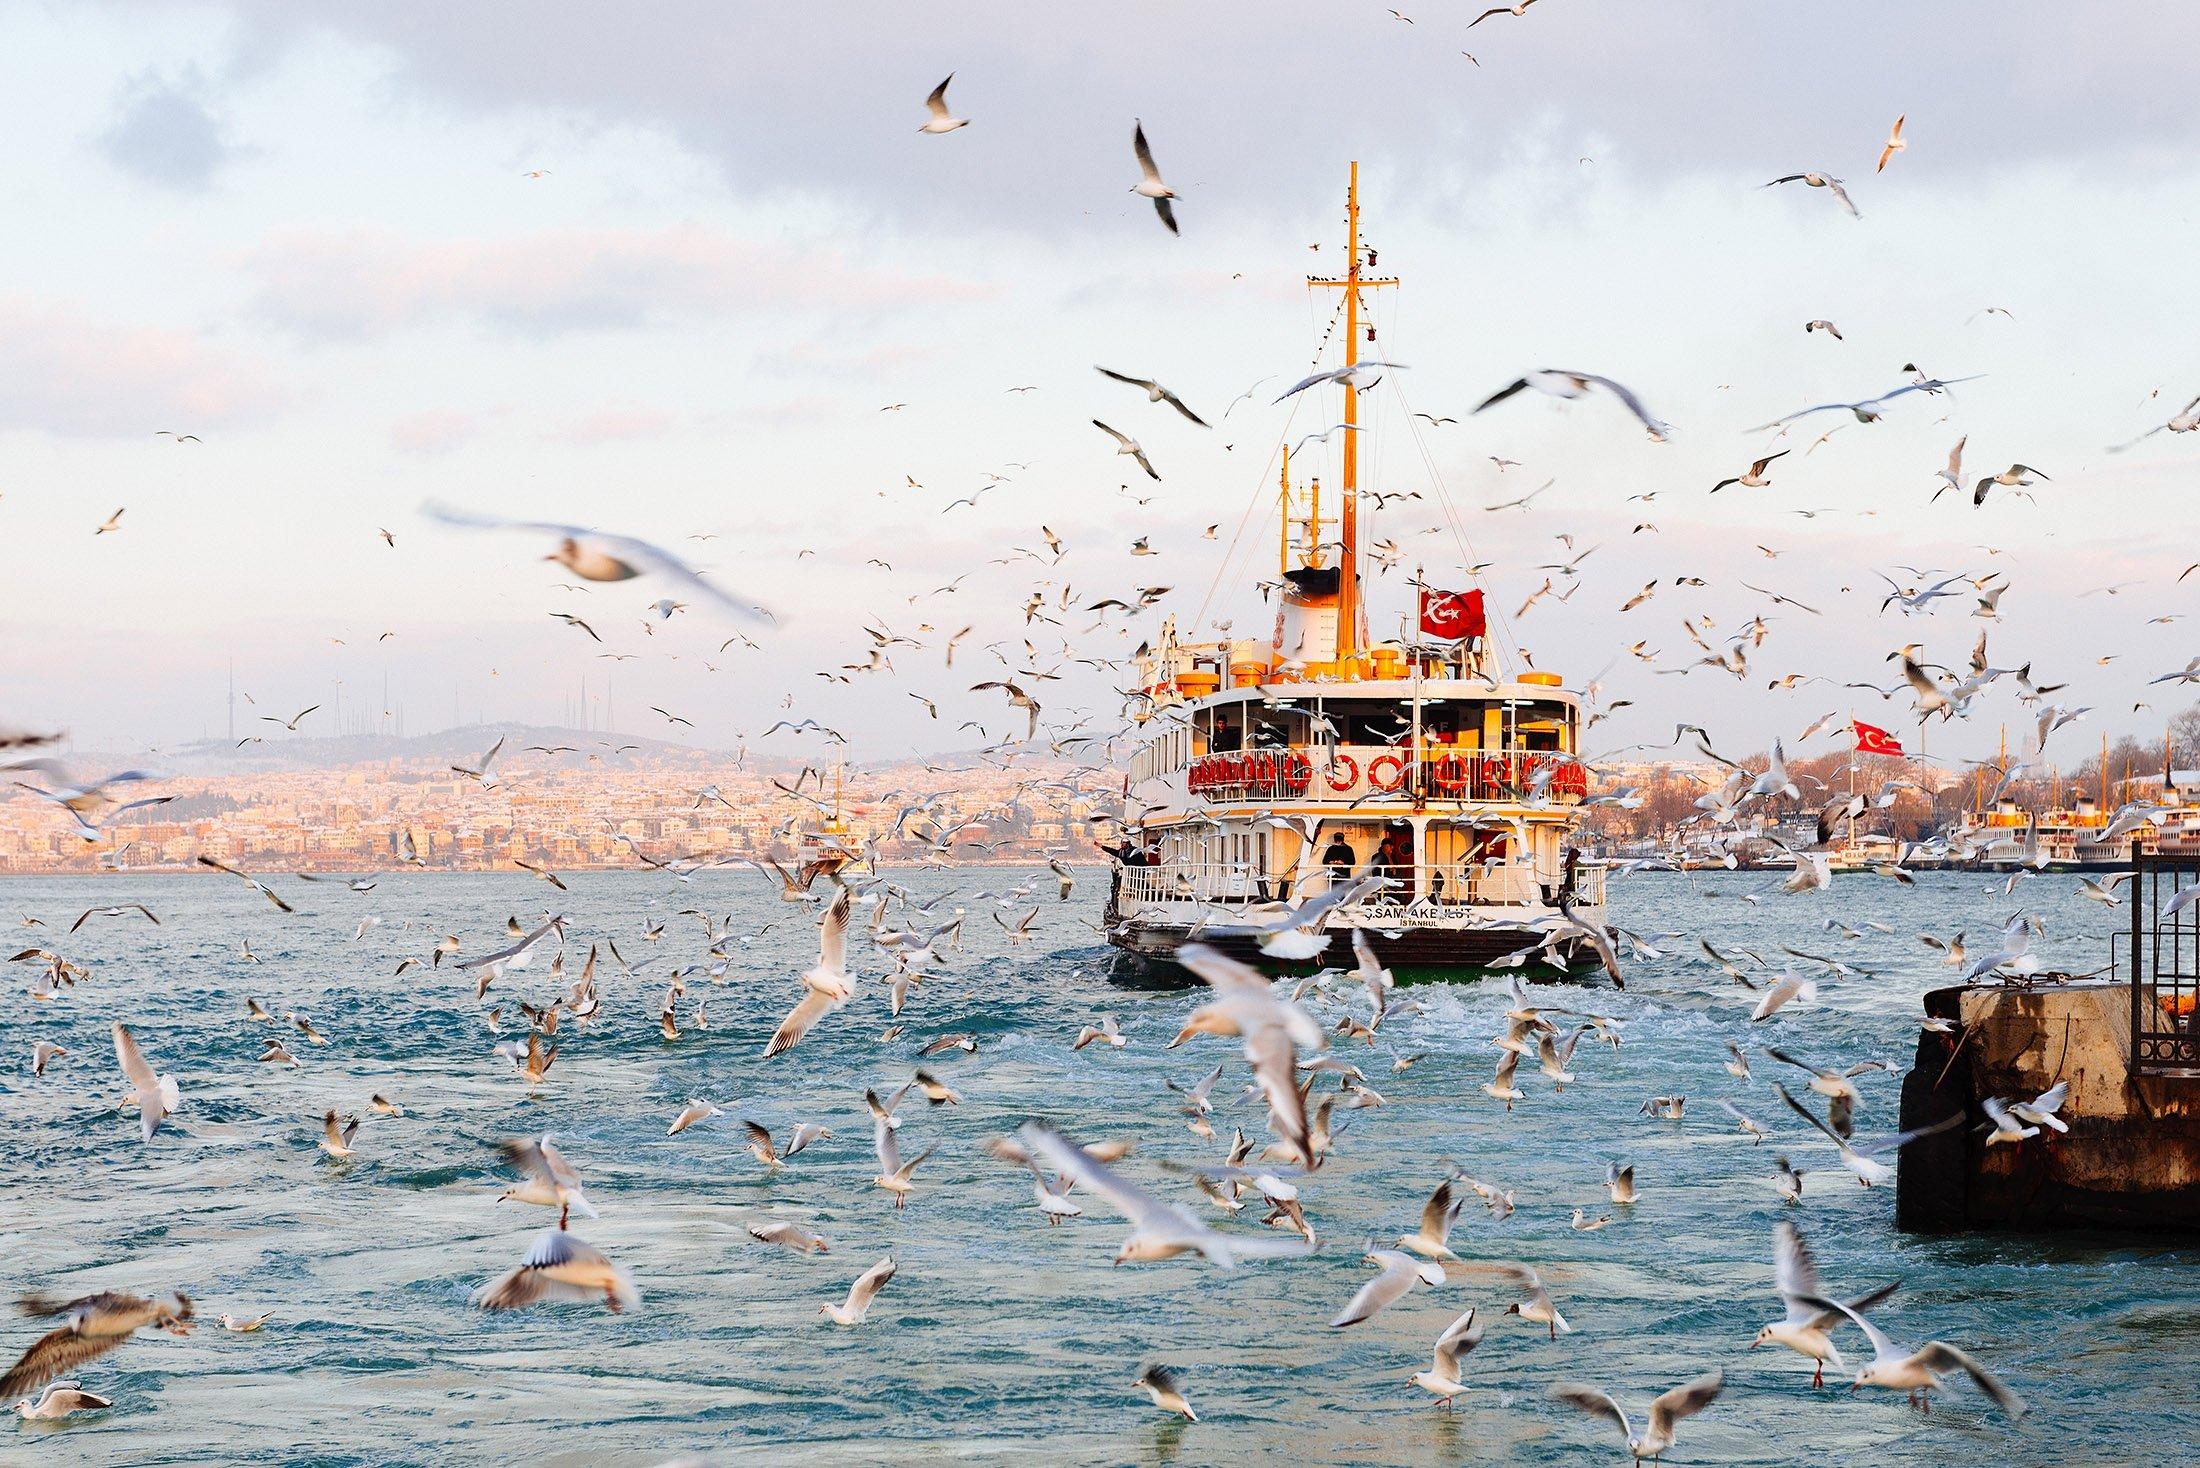 A ferry chugging through the Bosporus, Istanbul. (Shutterstock Photo)